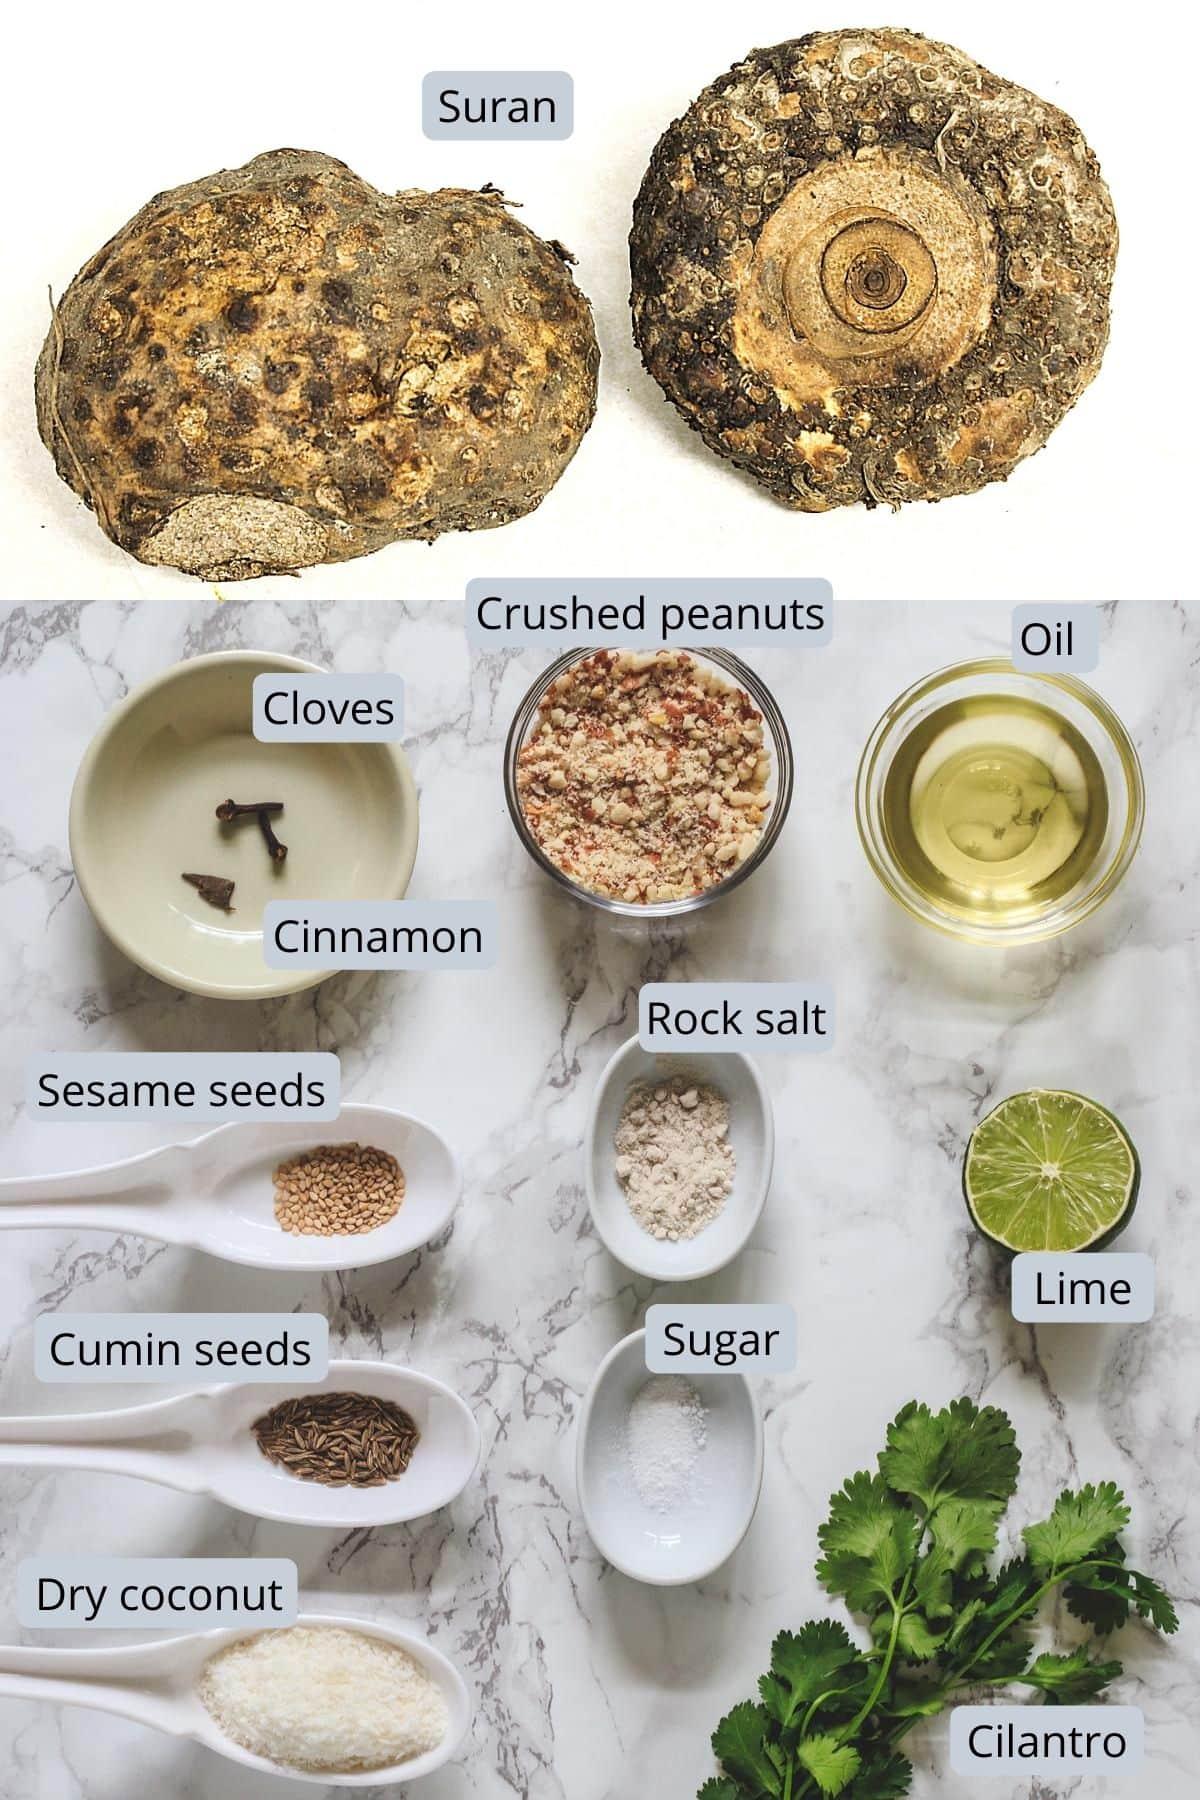 ingredients used in suran khichdi includes suran, oil, cumin, sesame, peanuts, coconut, salt, sugar, lime, cilantro, cloves, cinnamon